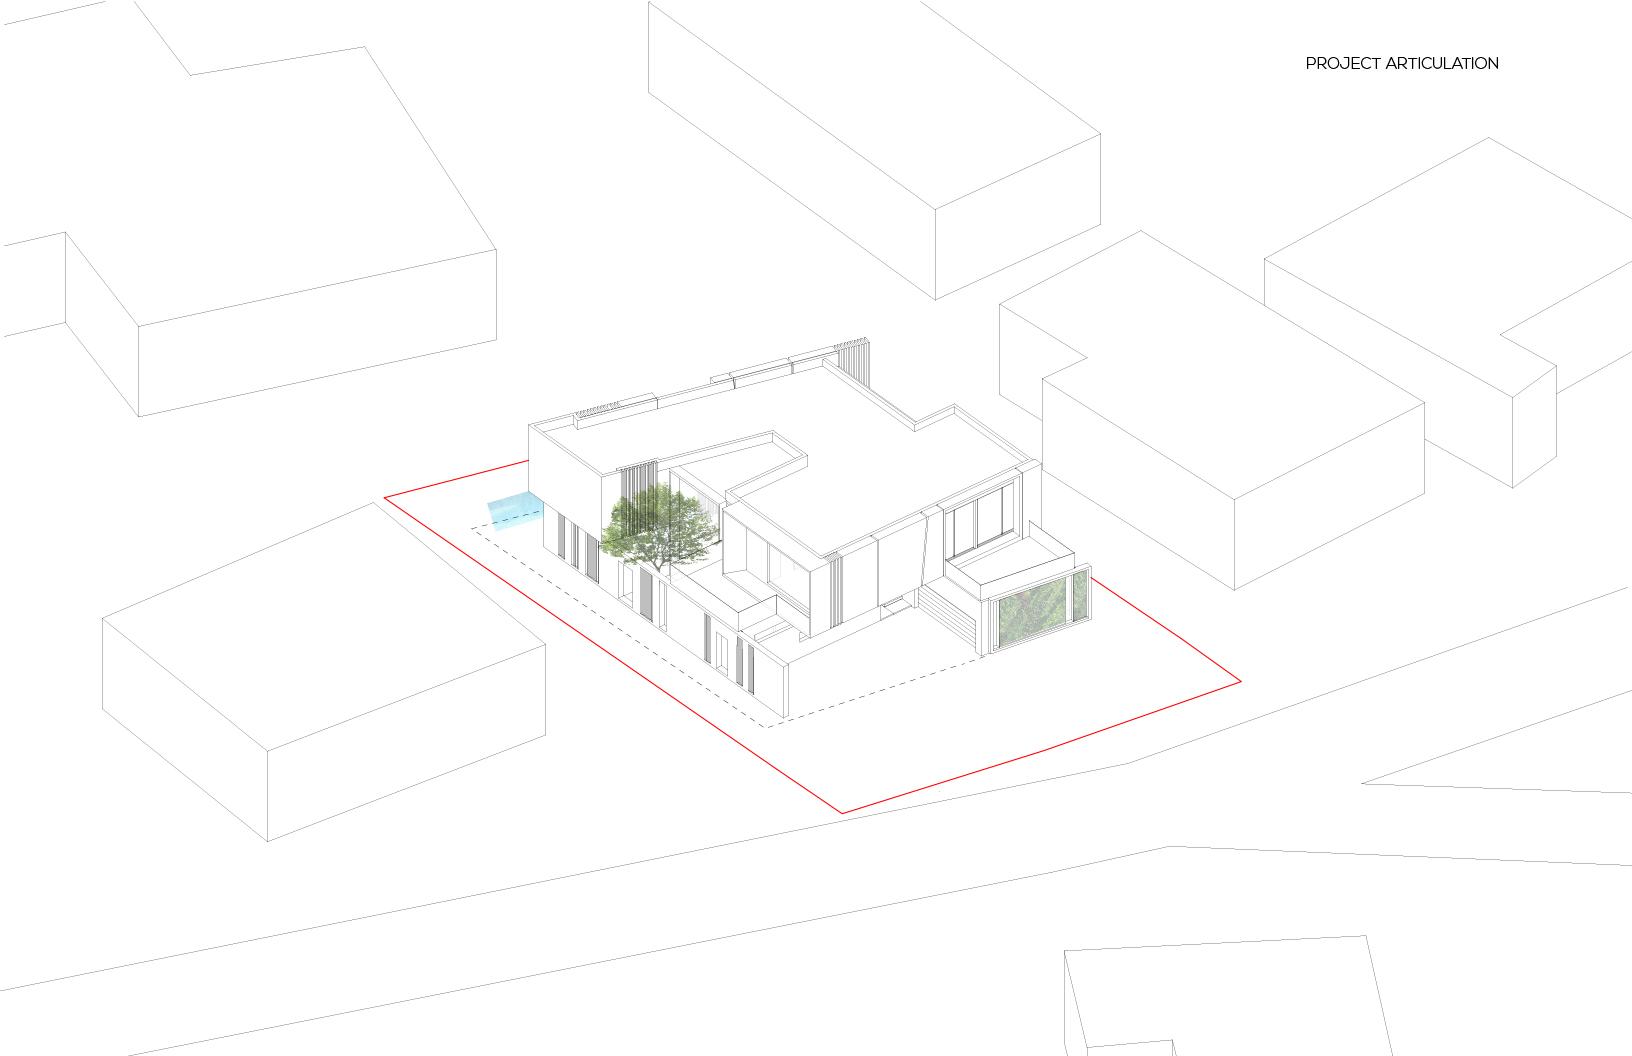 Garden House Full Project Diagram